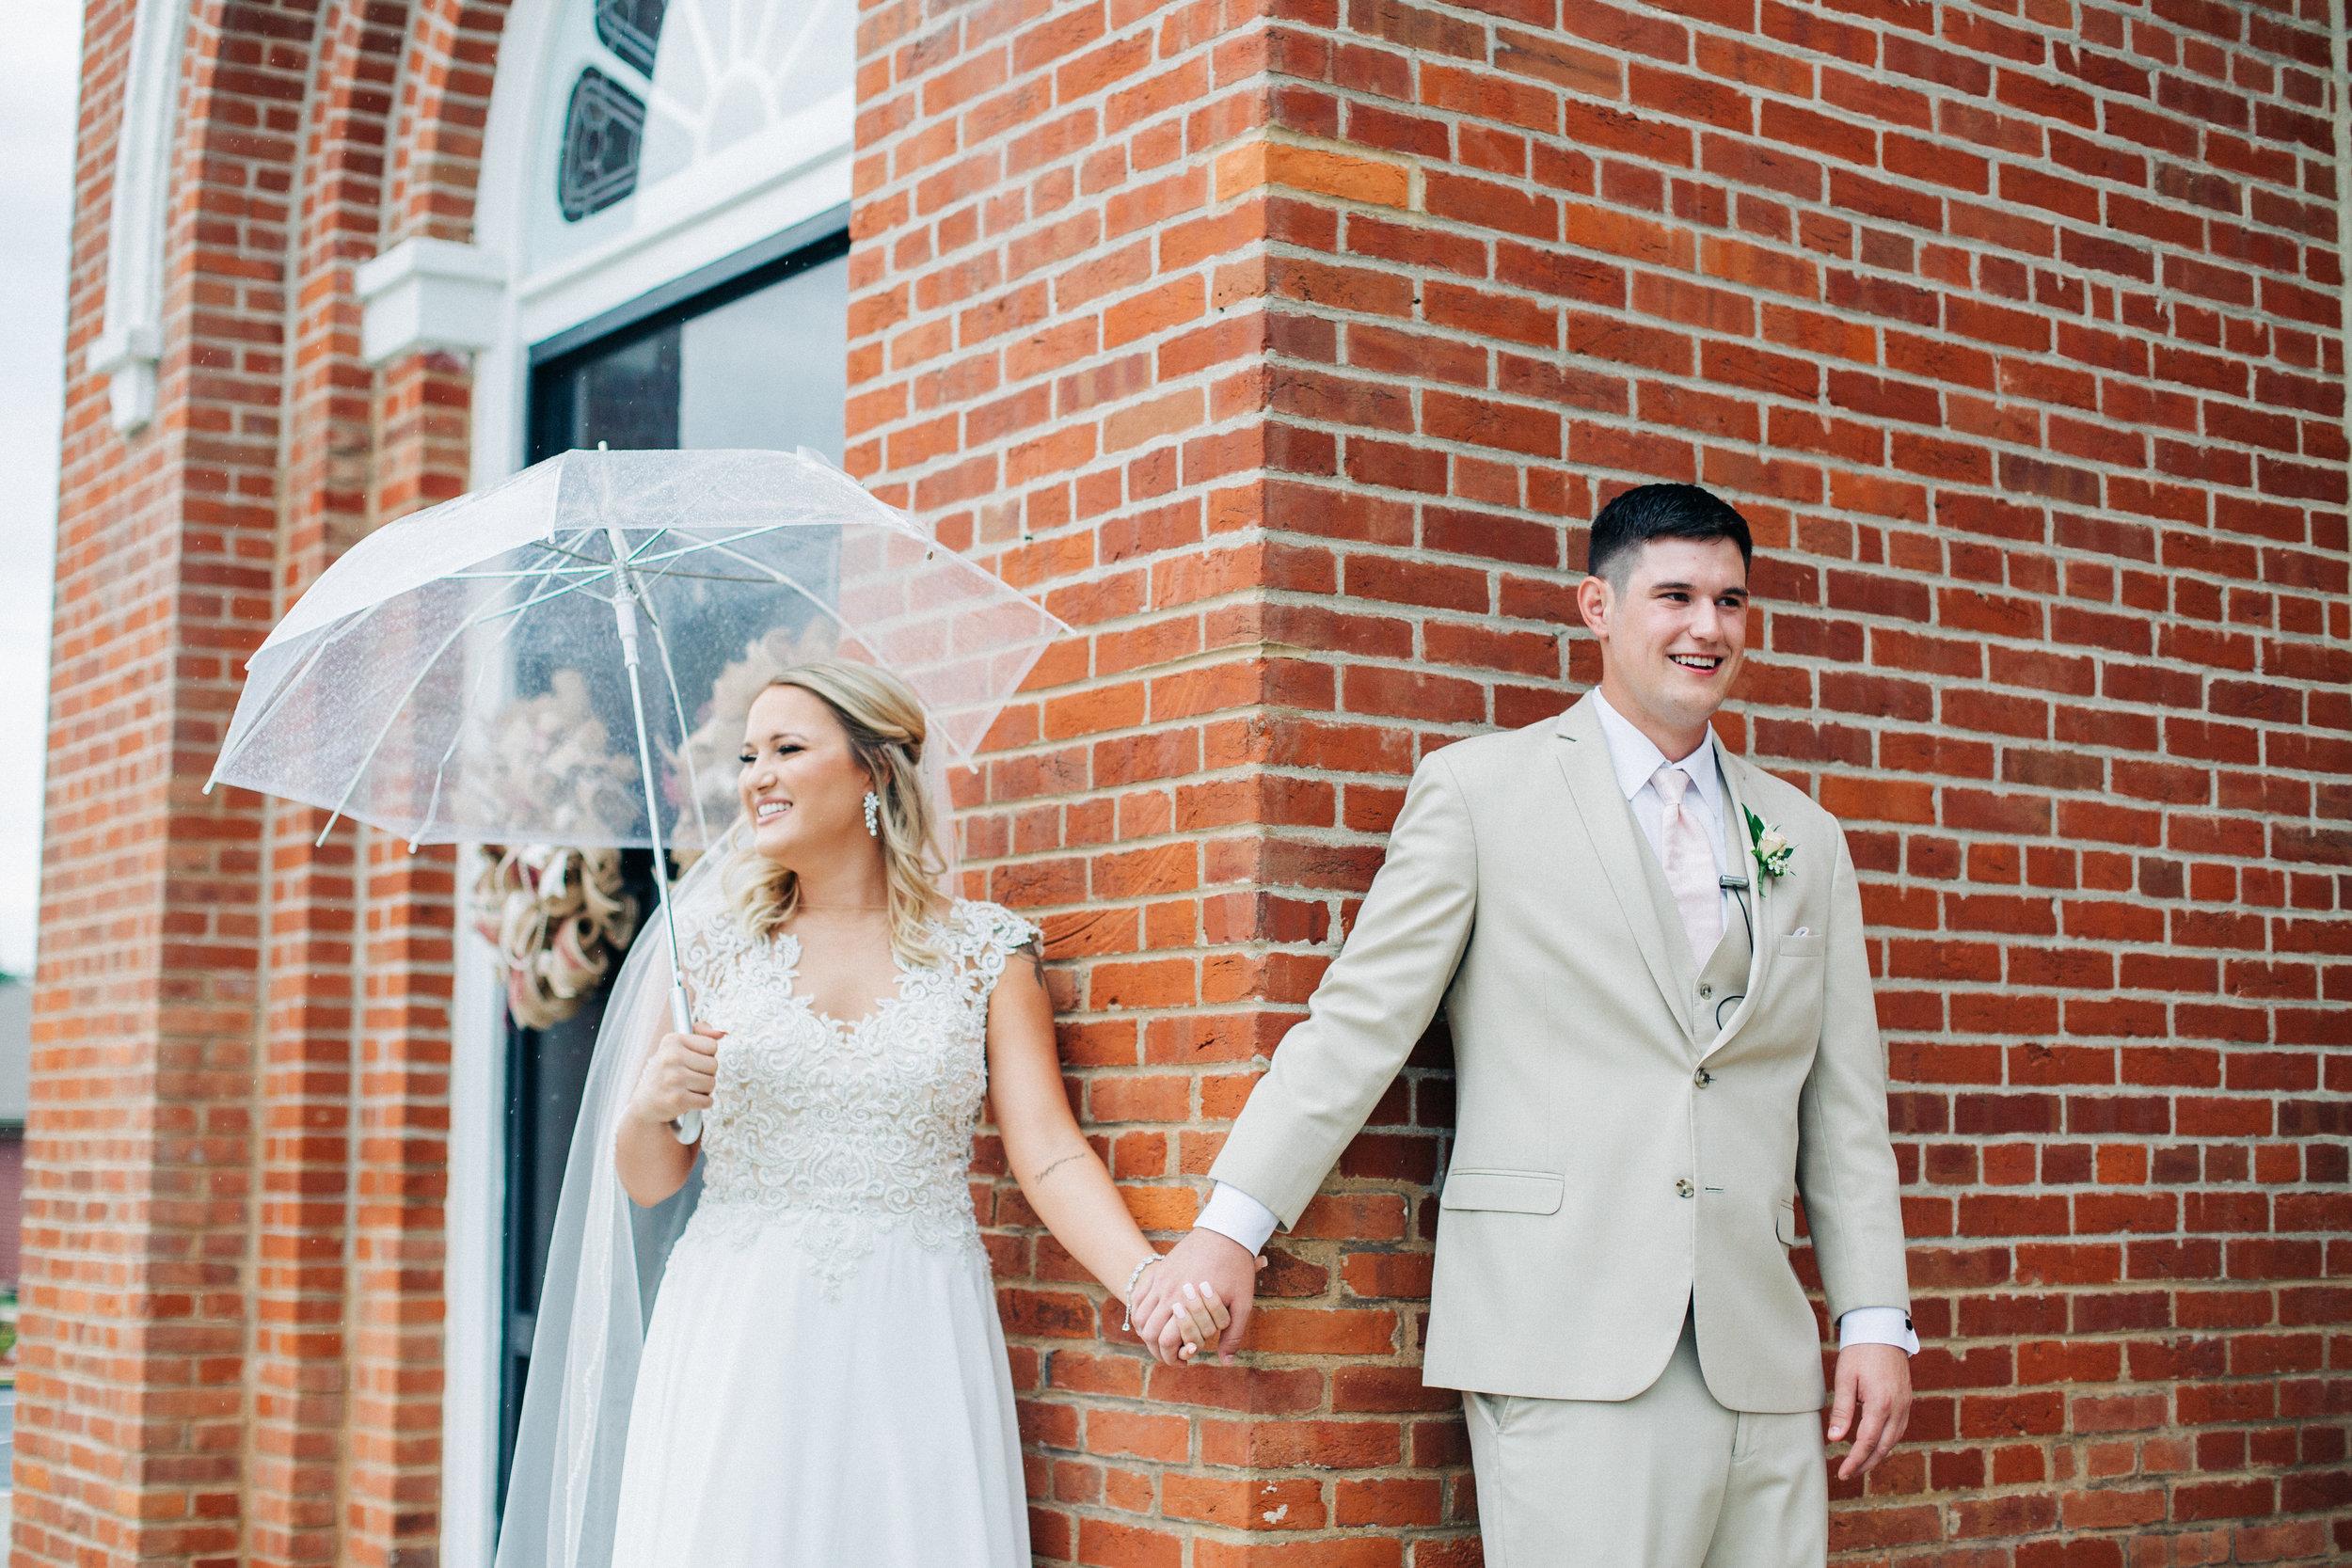 Dorothy_Louise_Photography_Marissa_Jake_Wentzville_MO_Wedding-133.jpg